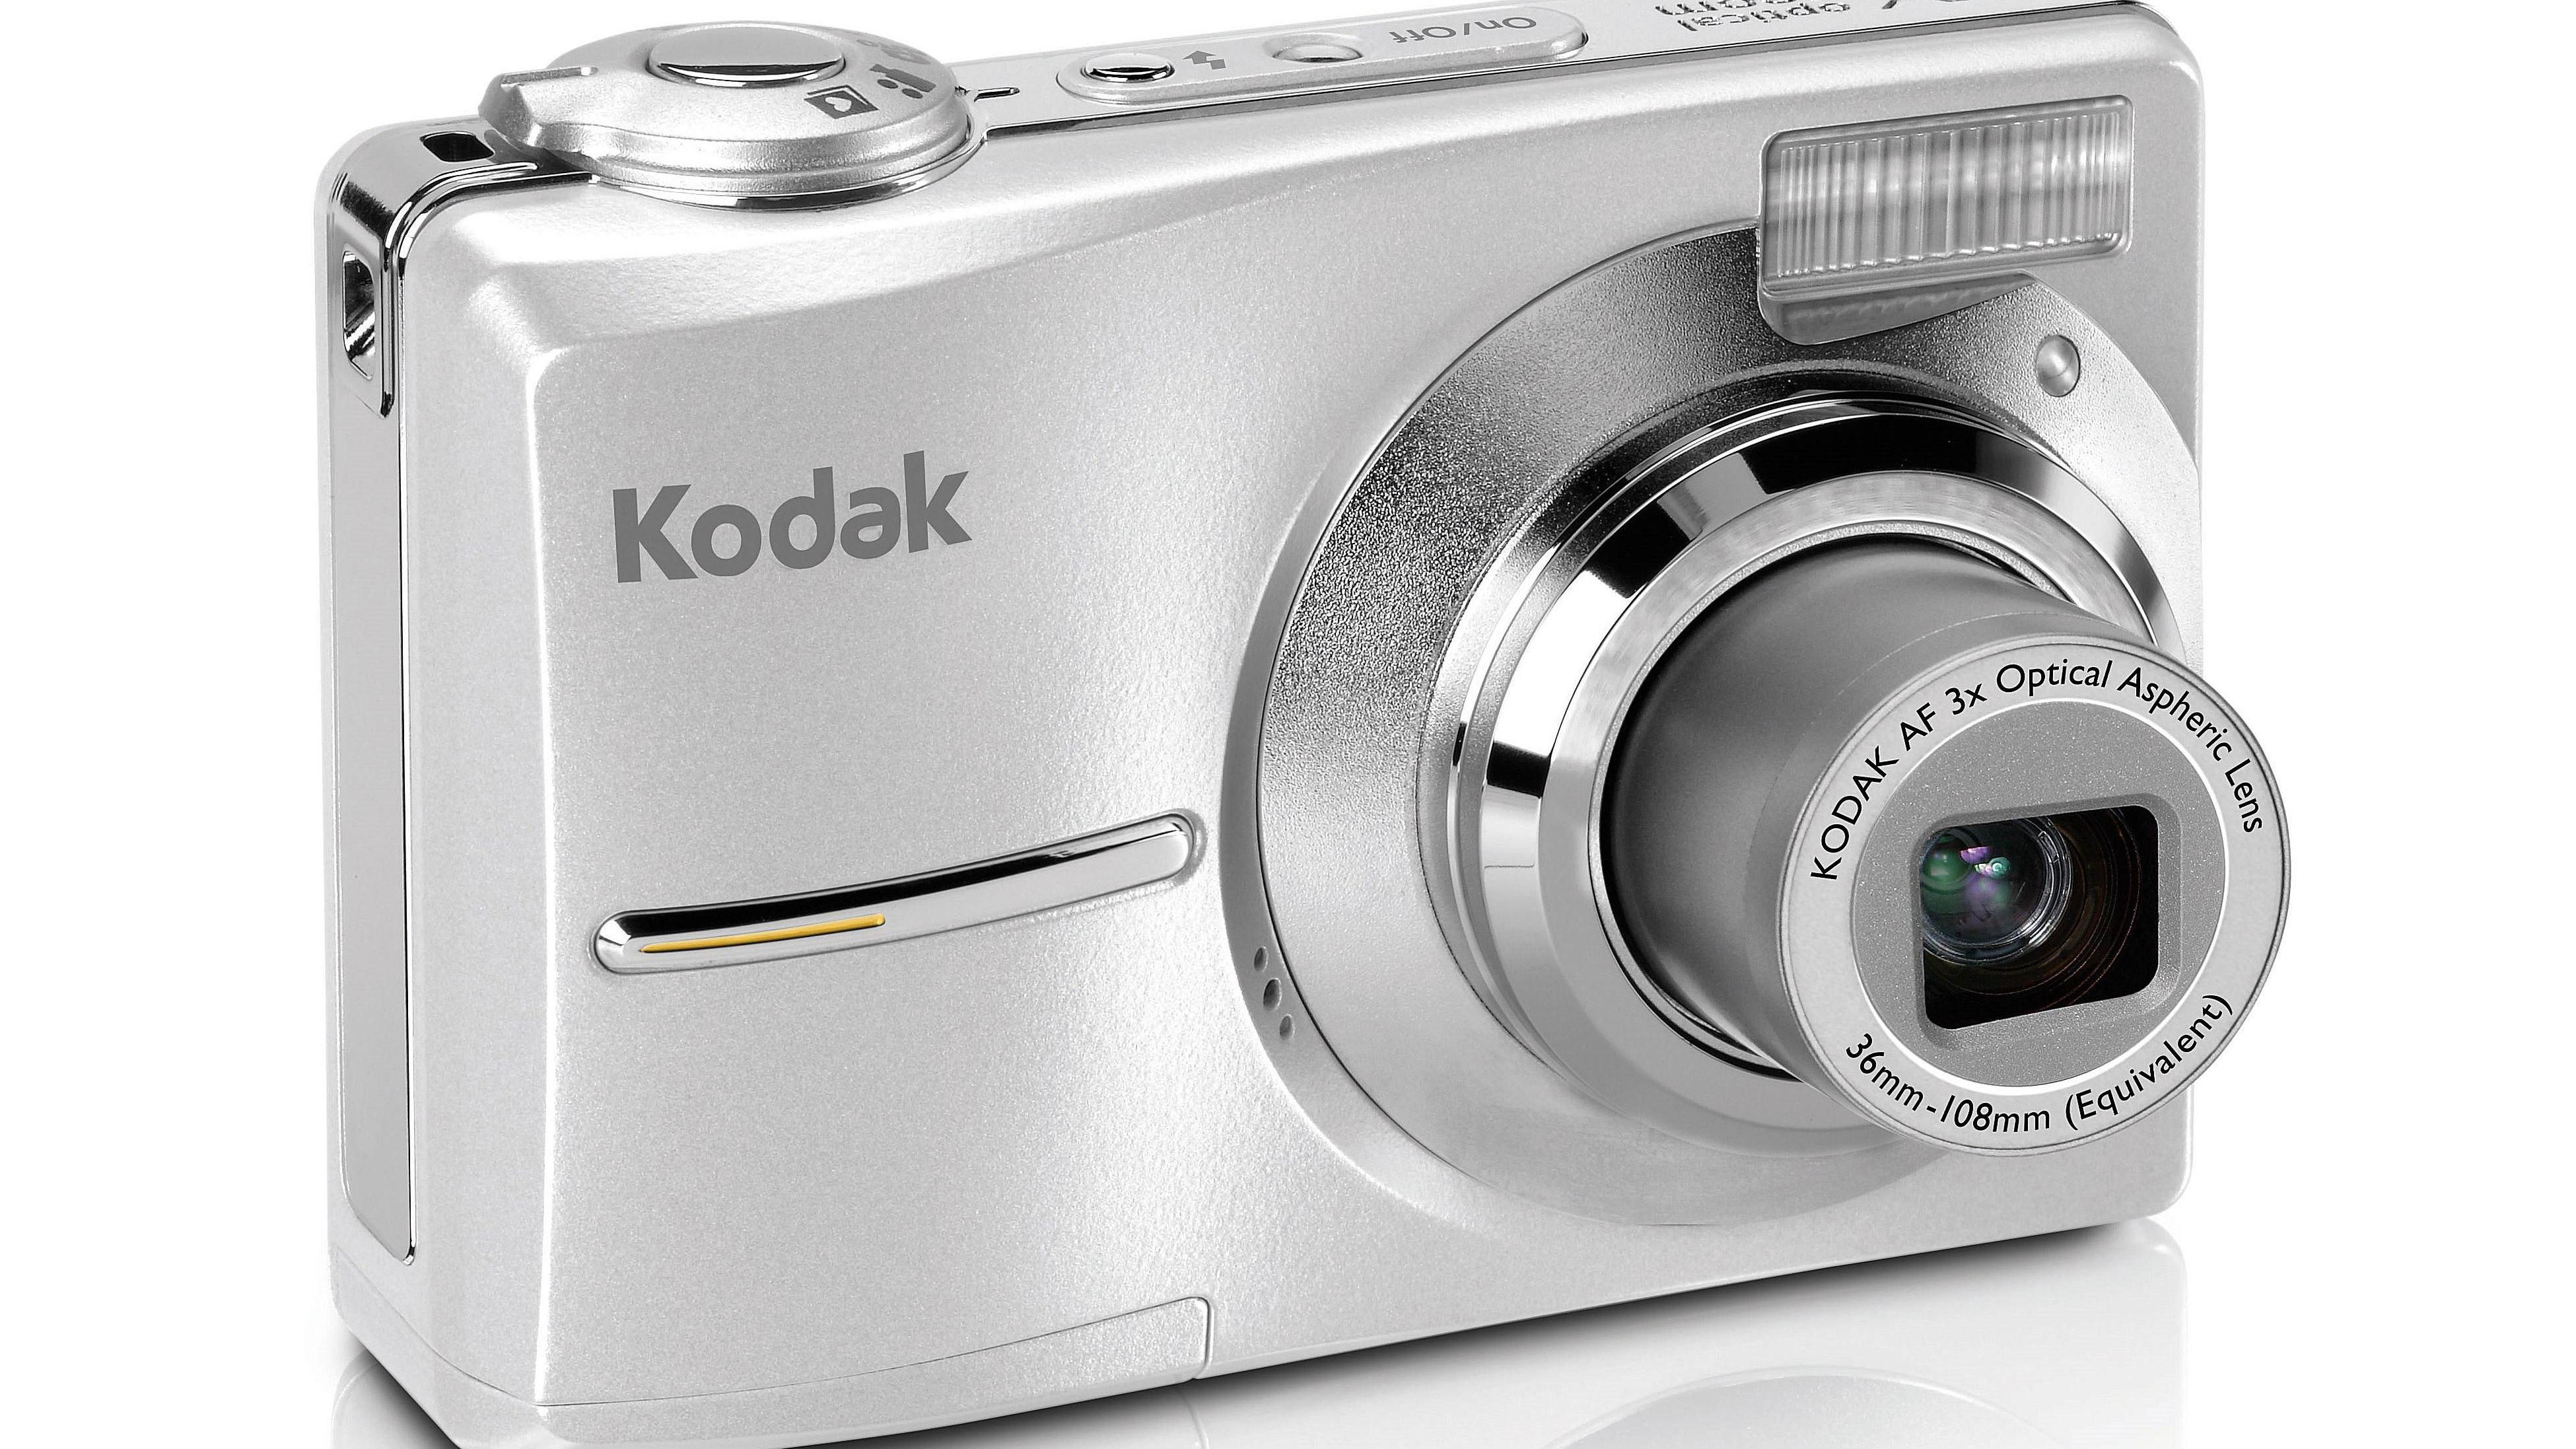 Troubleshooting Kodak Cameras — Fix Your Kodak Camera